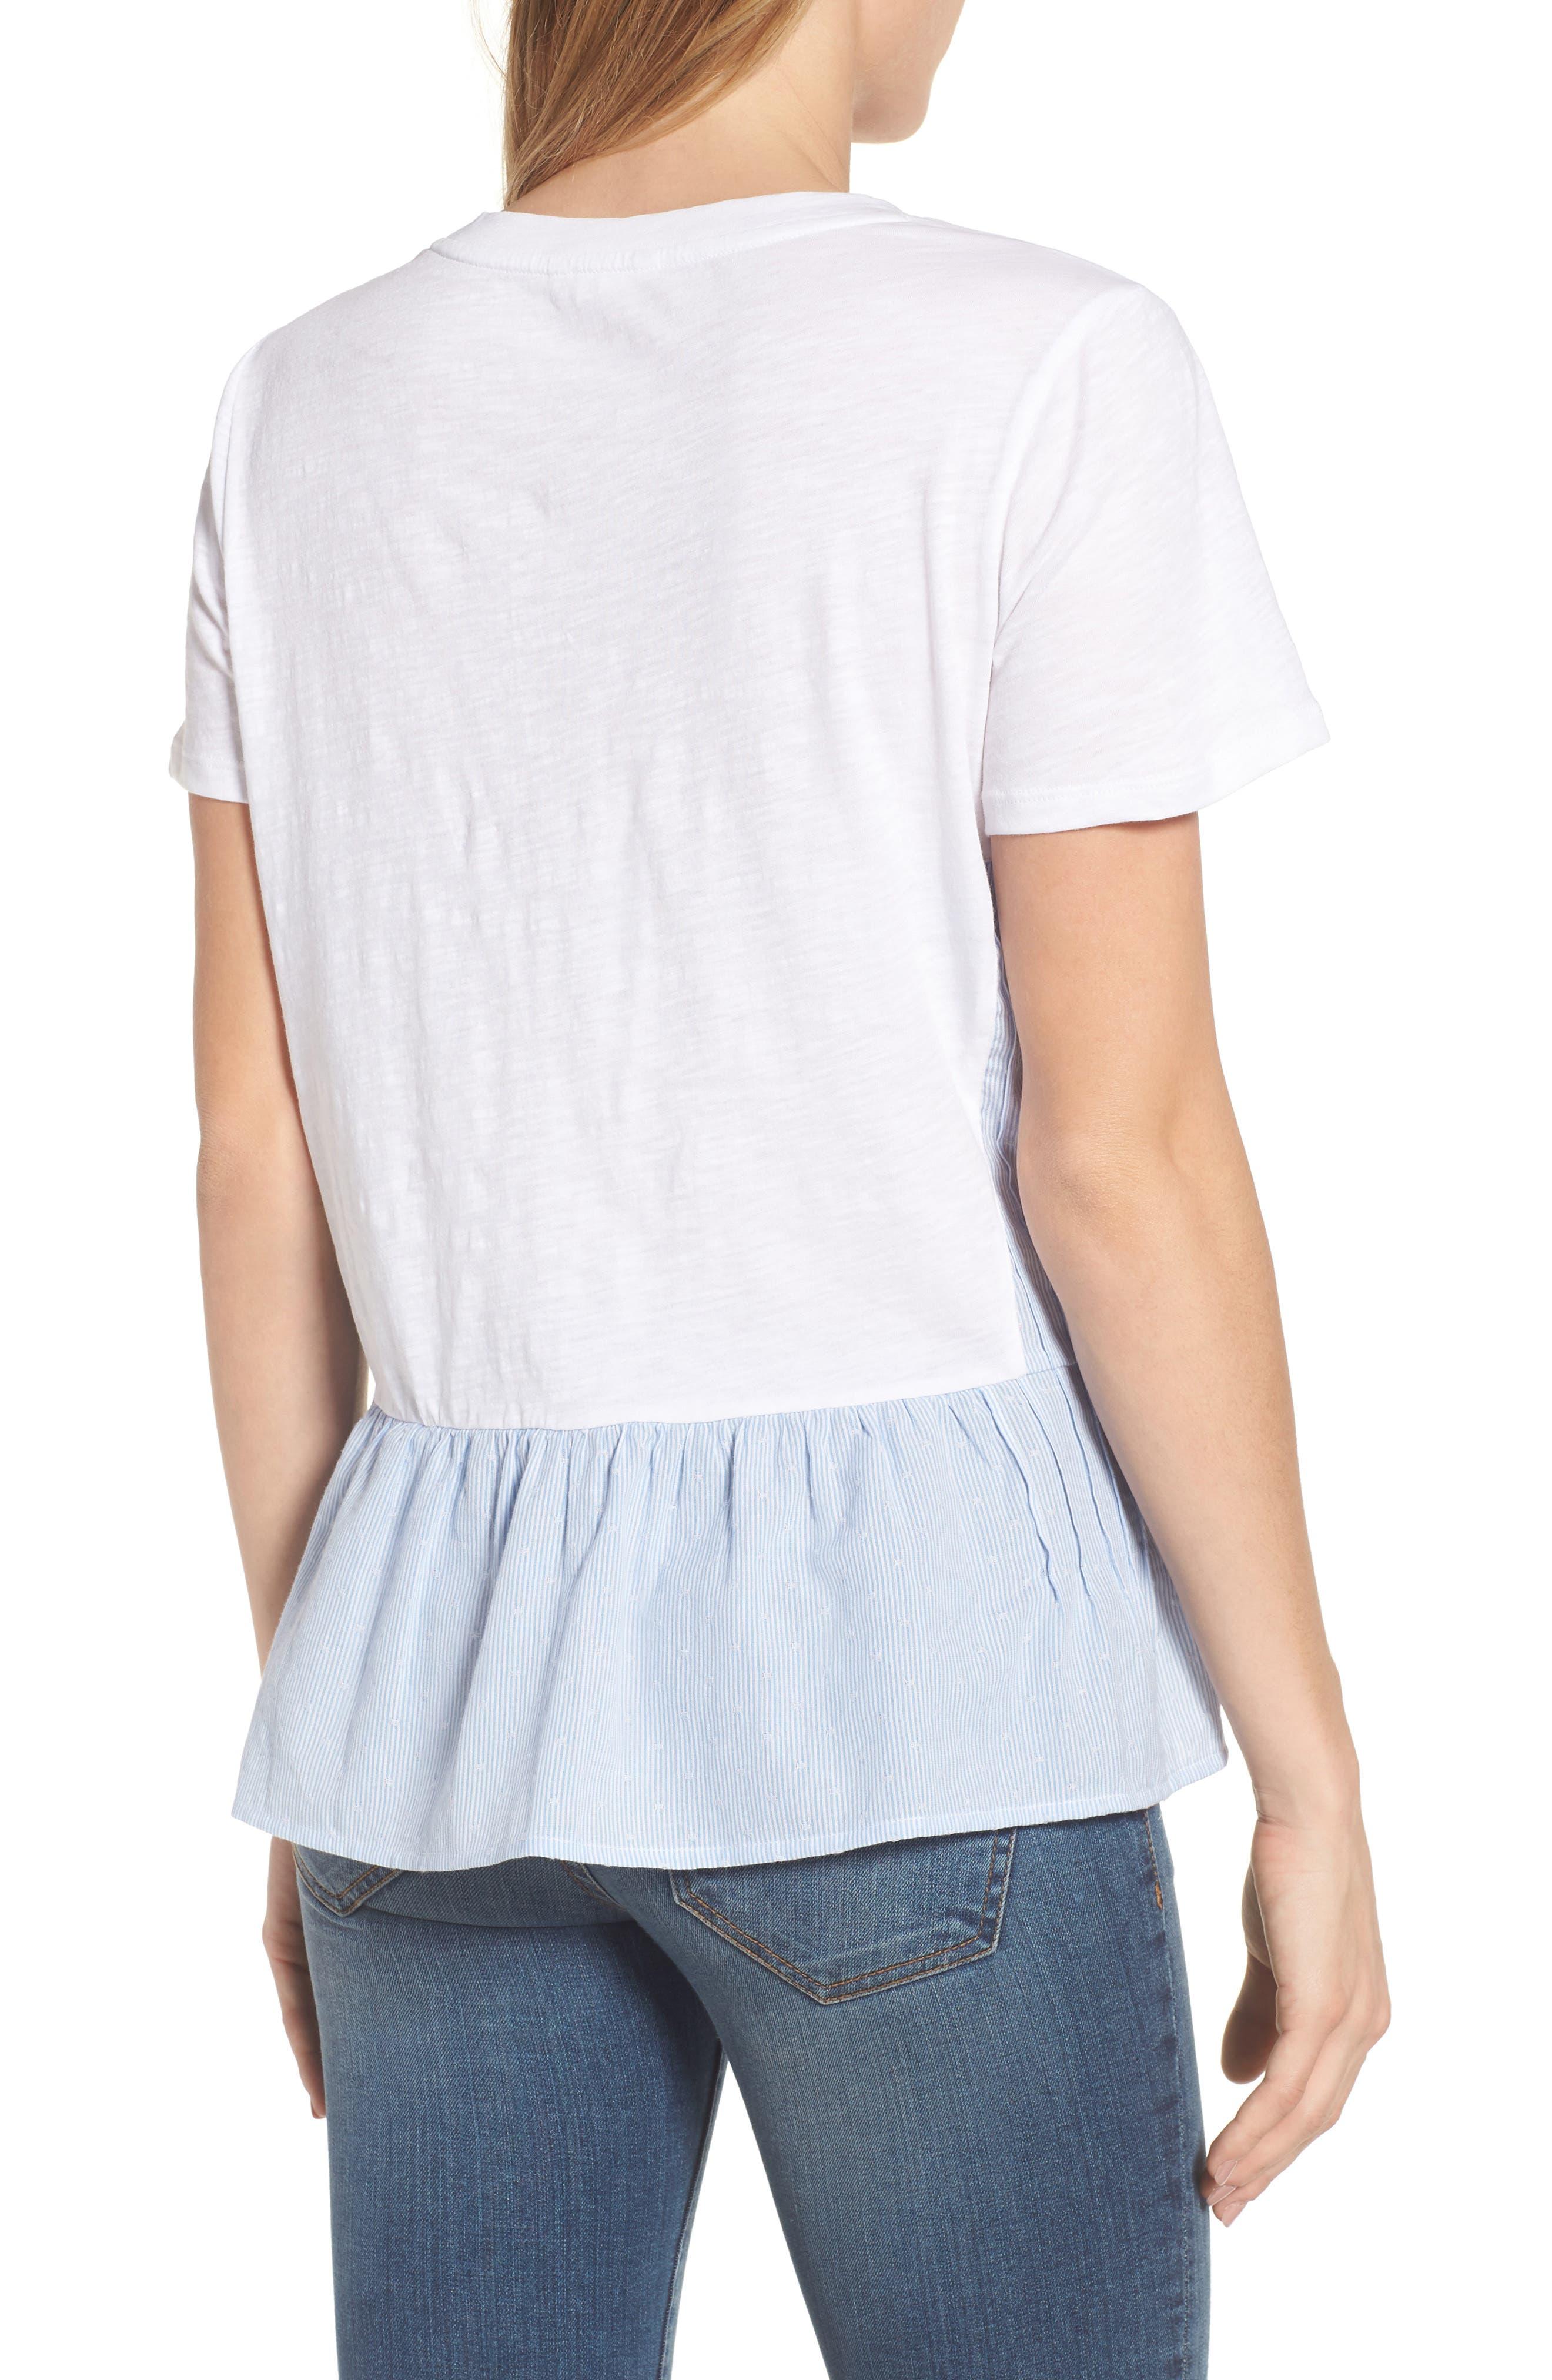 Layered Look Tee,                             Alternate thumbnail 2, color,                             White- Blue White Dobby Stripe